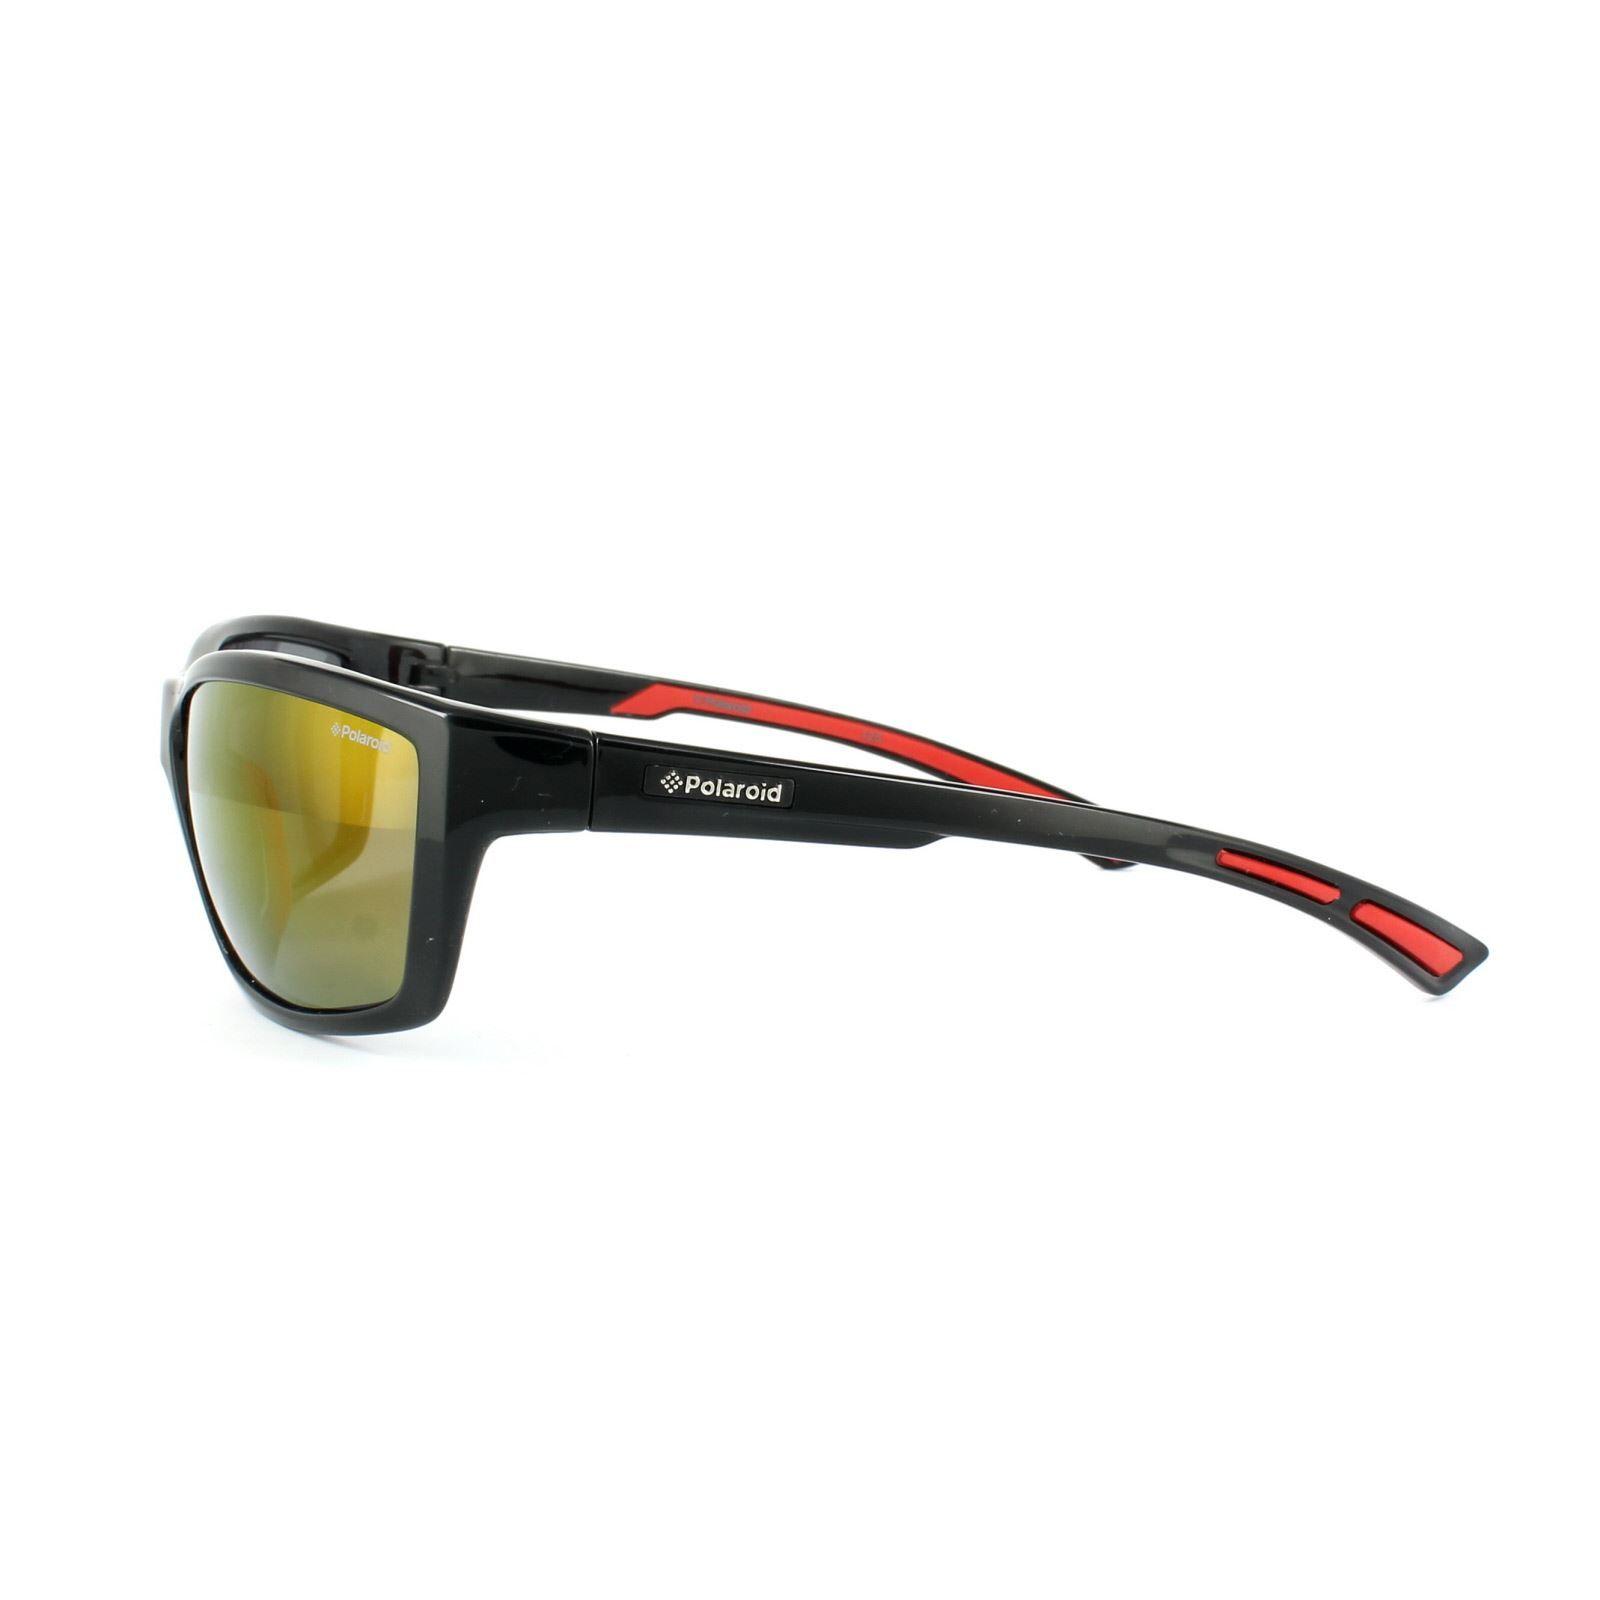 Polaroid Sport Sunglasses P7400 0A2 JB Black & Red Silver Mirror Polarized